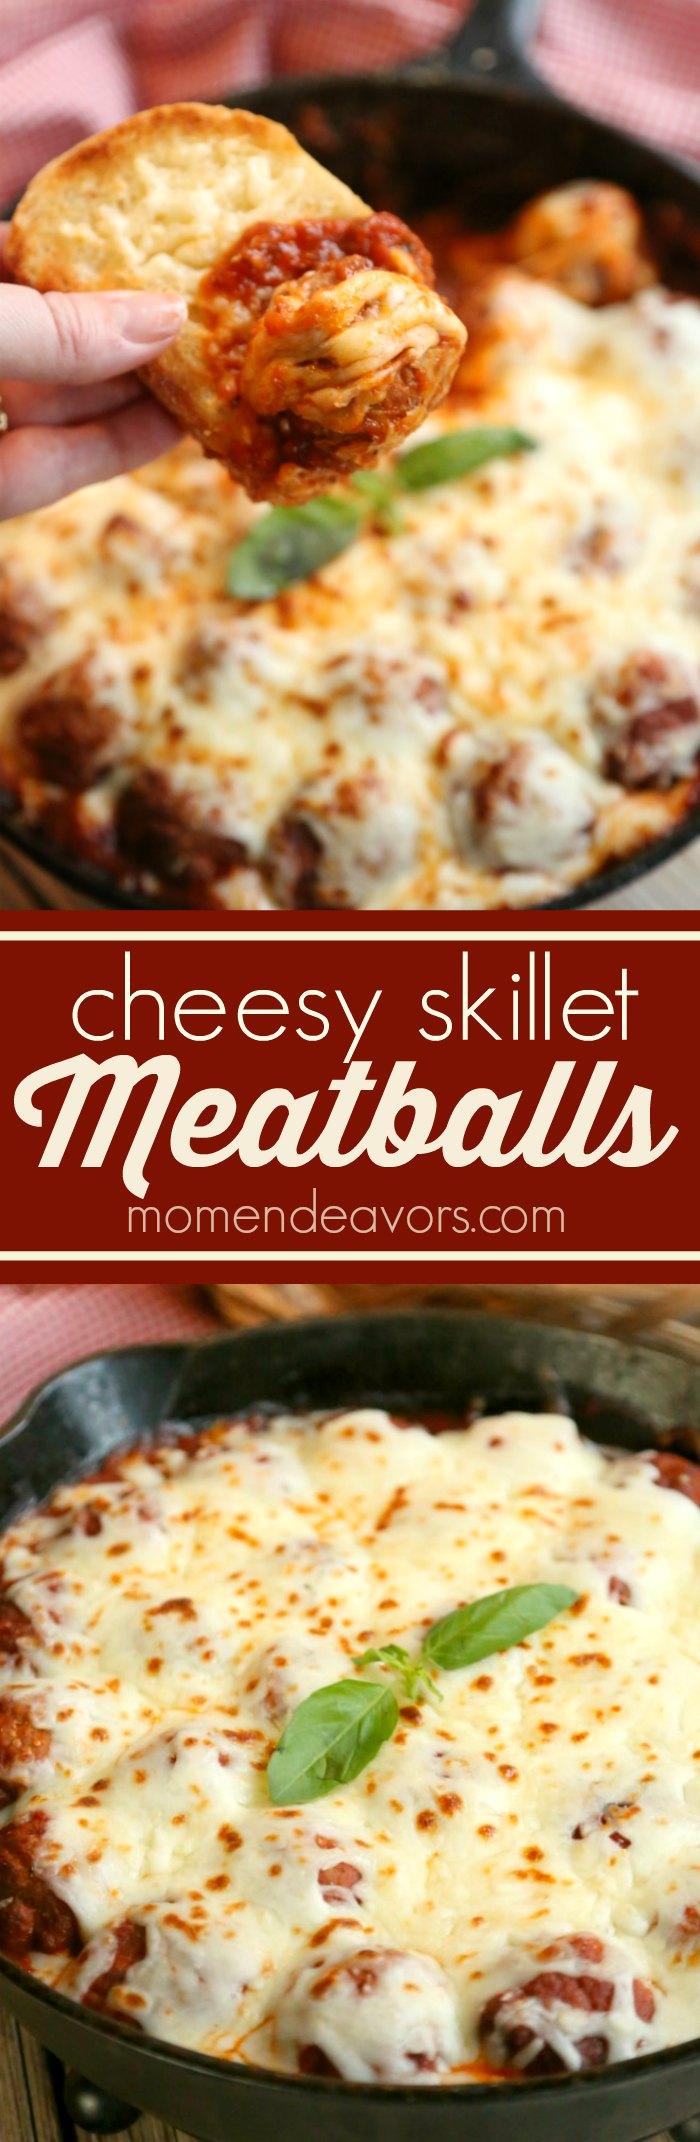 Cheesy Skillet Meatballs Recipe